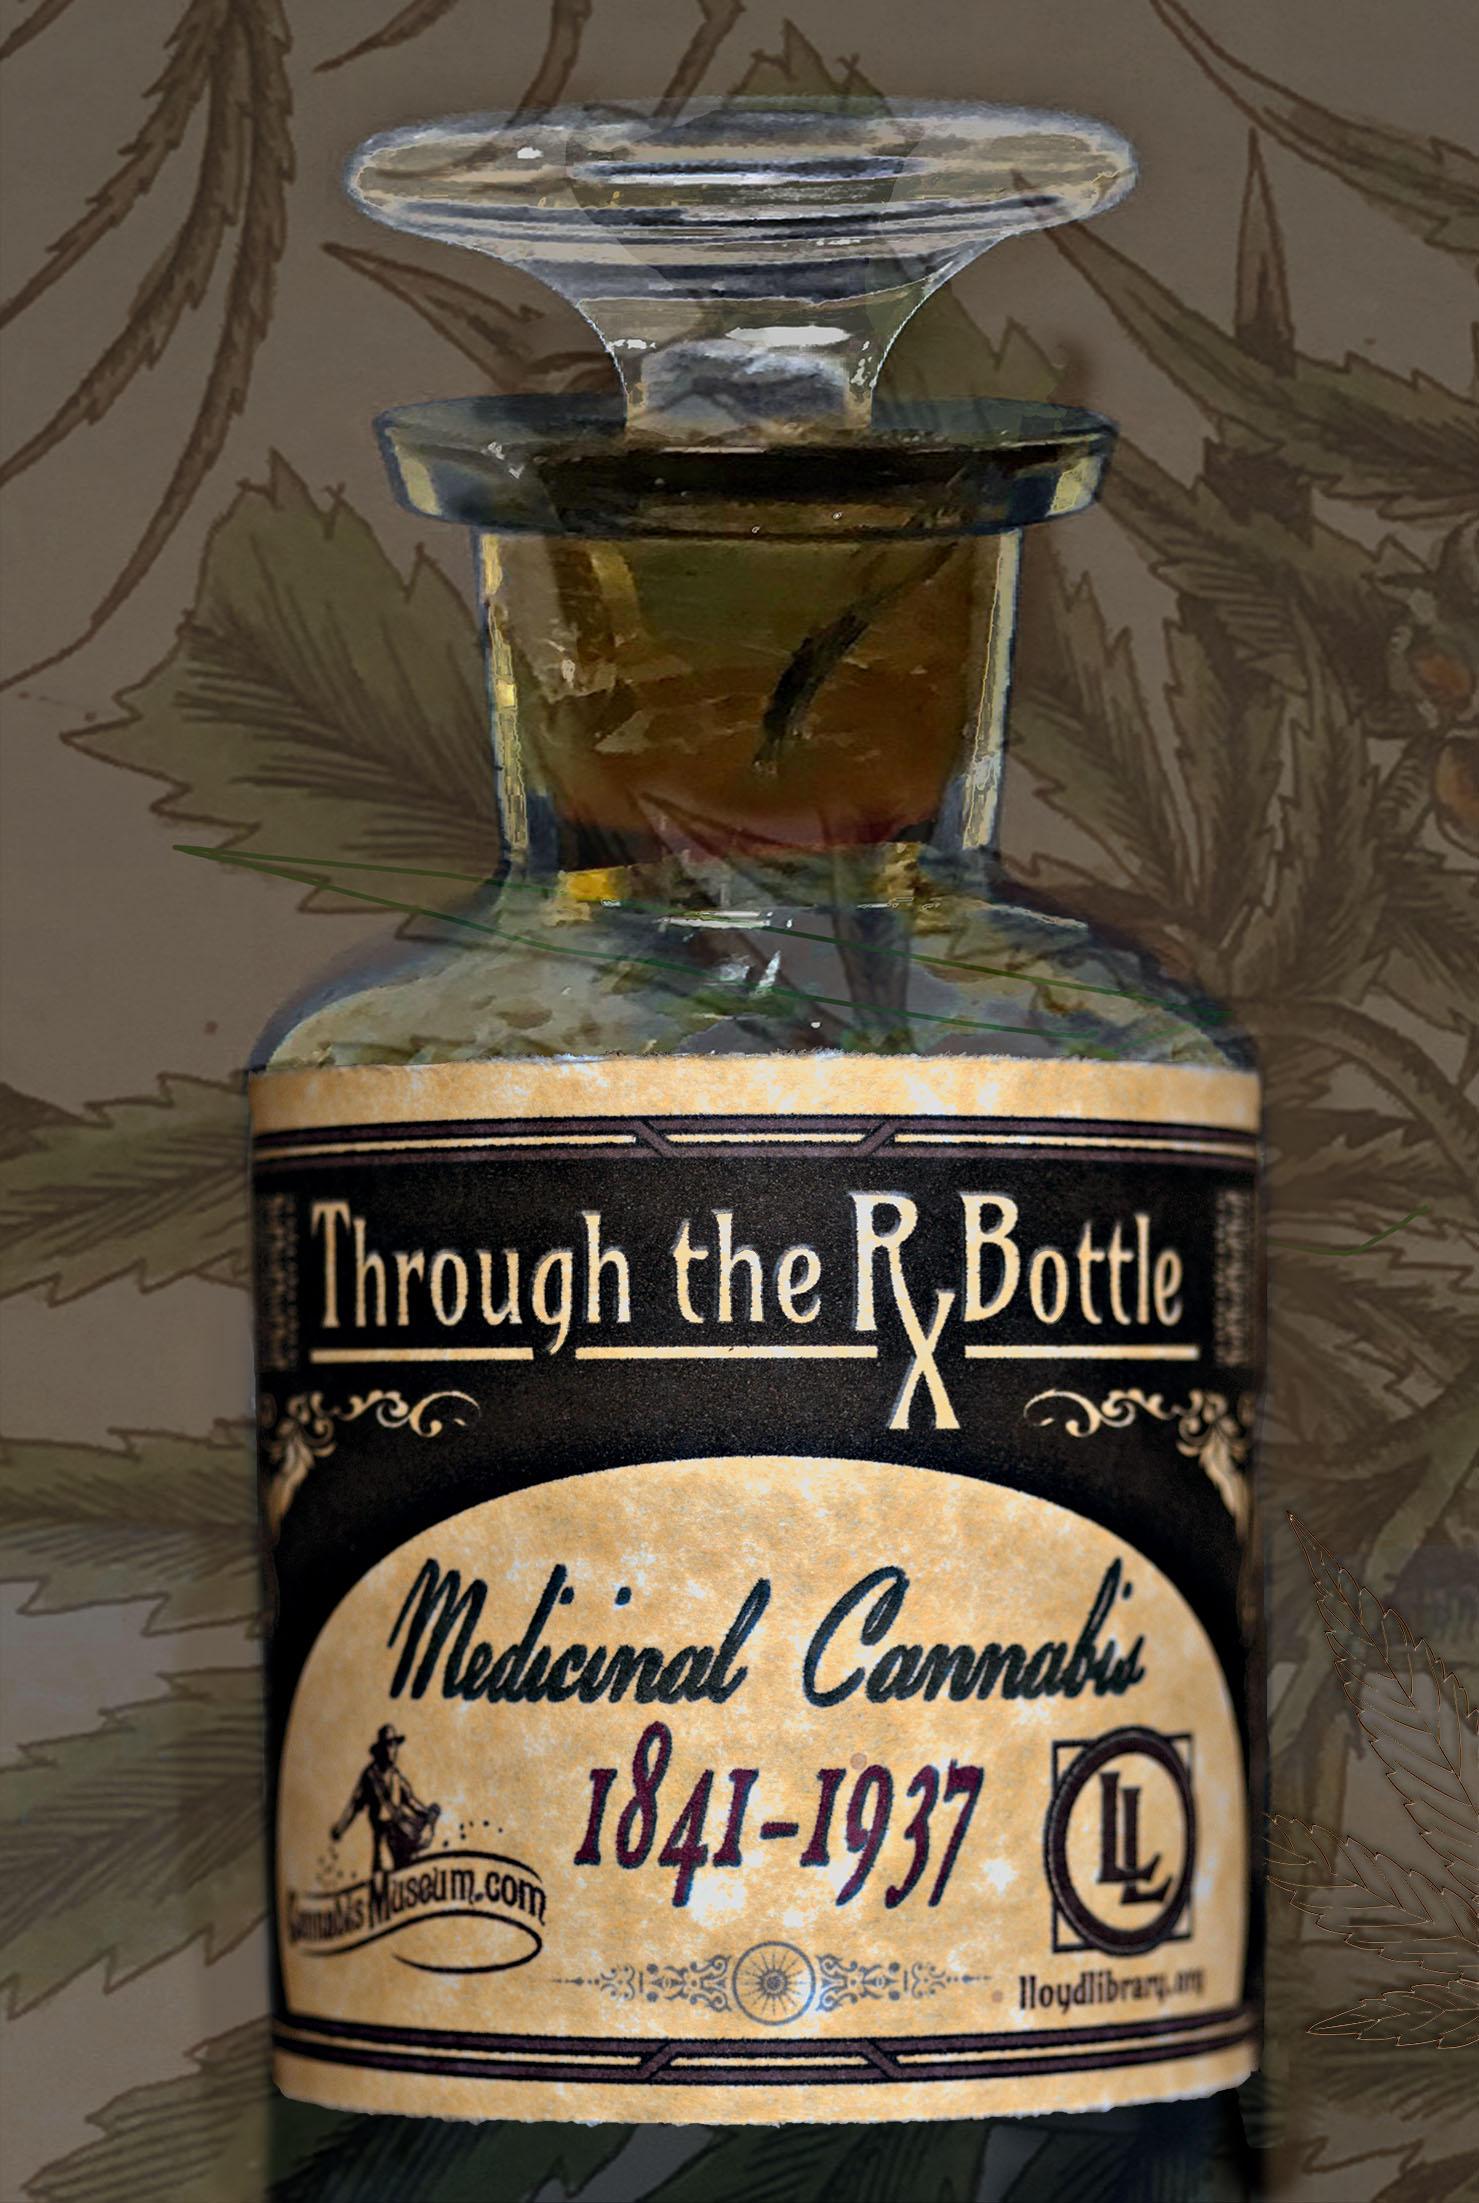 through_the_rx_bottle.jpg